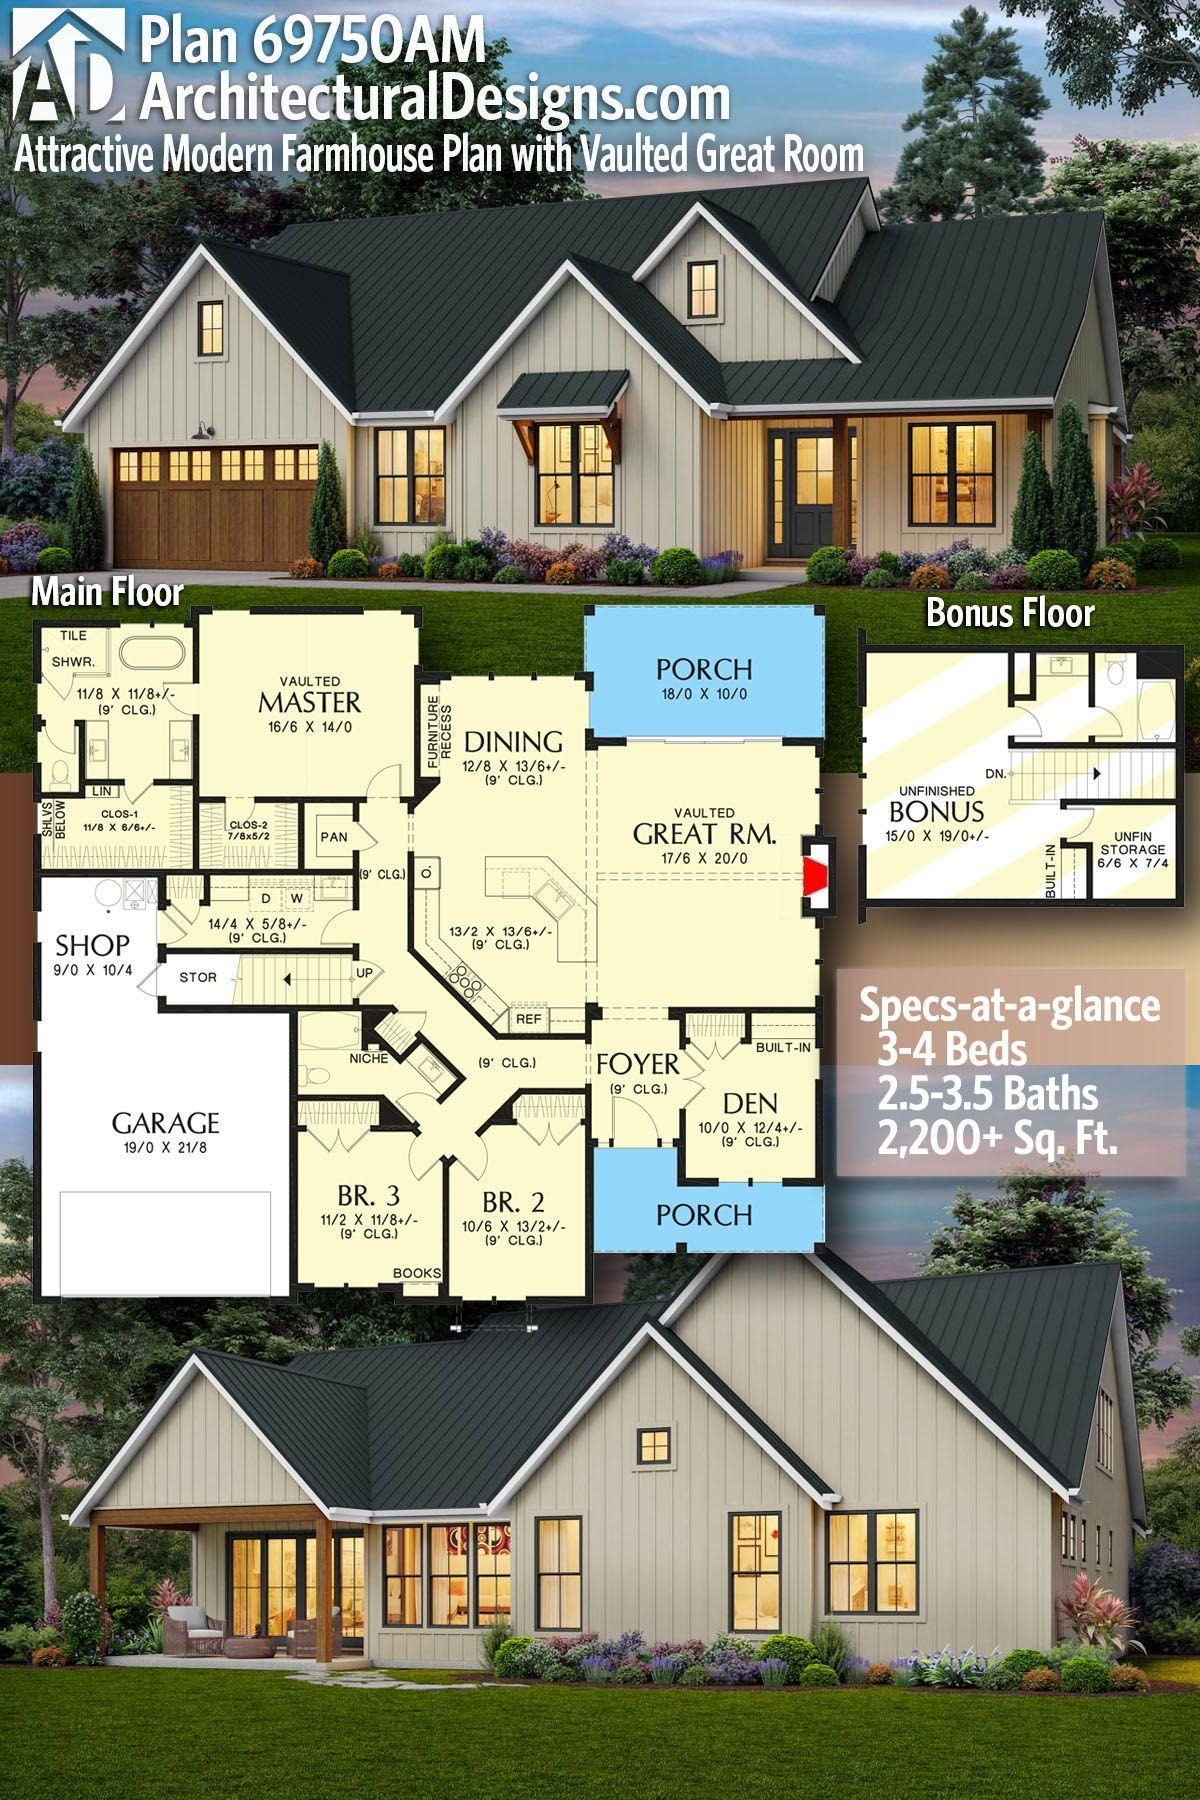 Plan 69750am Attractive Modern Farmhouse Plan With Vaulted Great Room In 2020 Modern Farmhouse Plans Farmhouse Plans House Blueprints